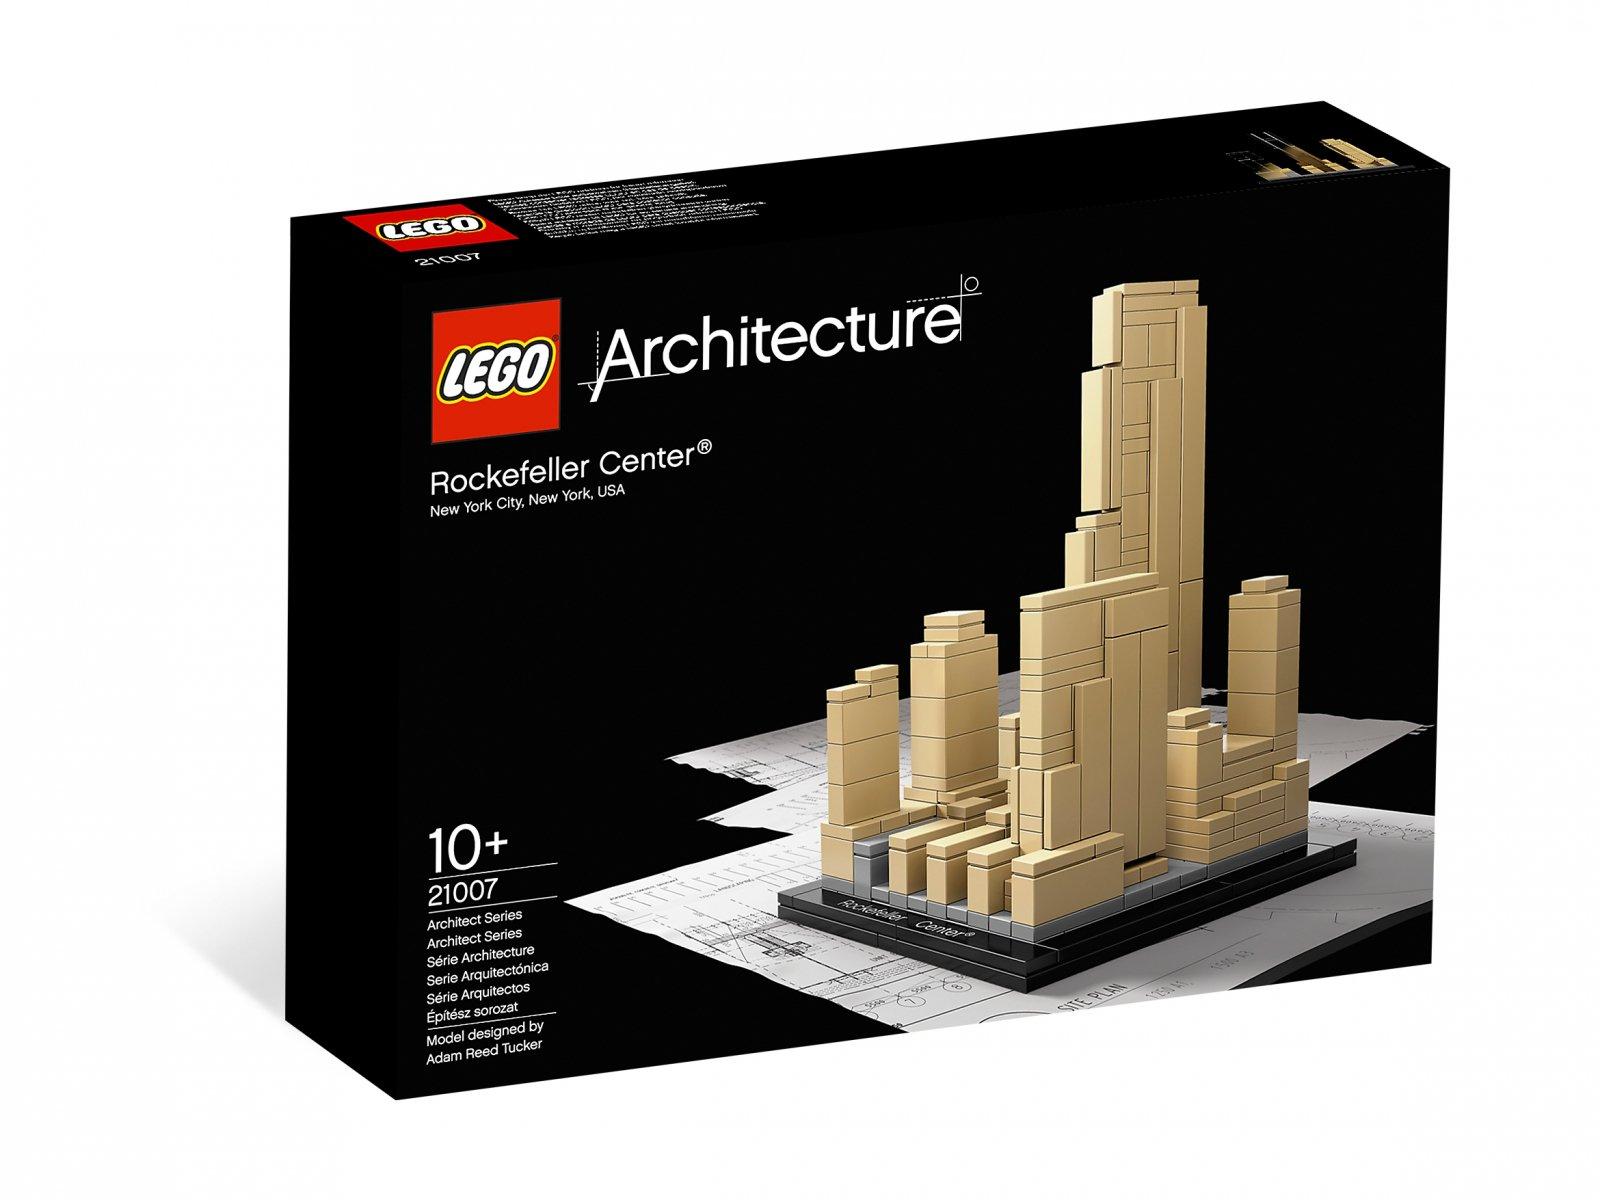 LEGO 21007 Architecture Rockefeller Center®